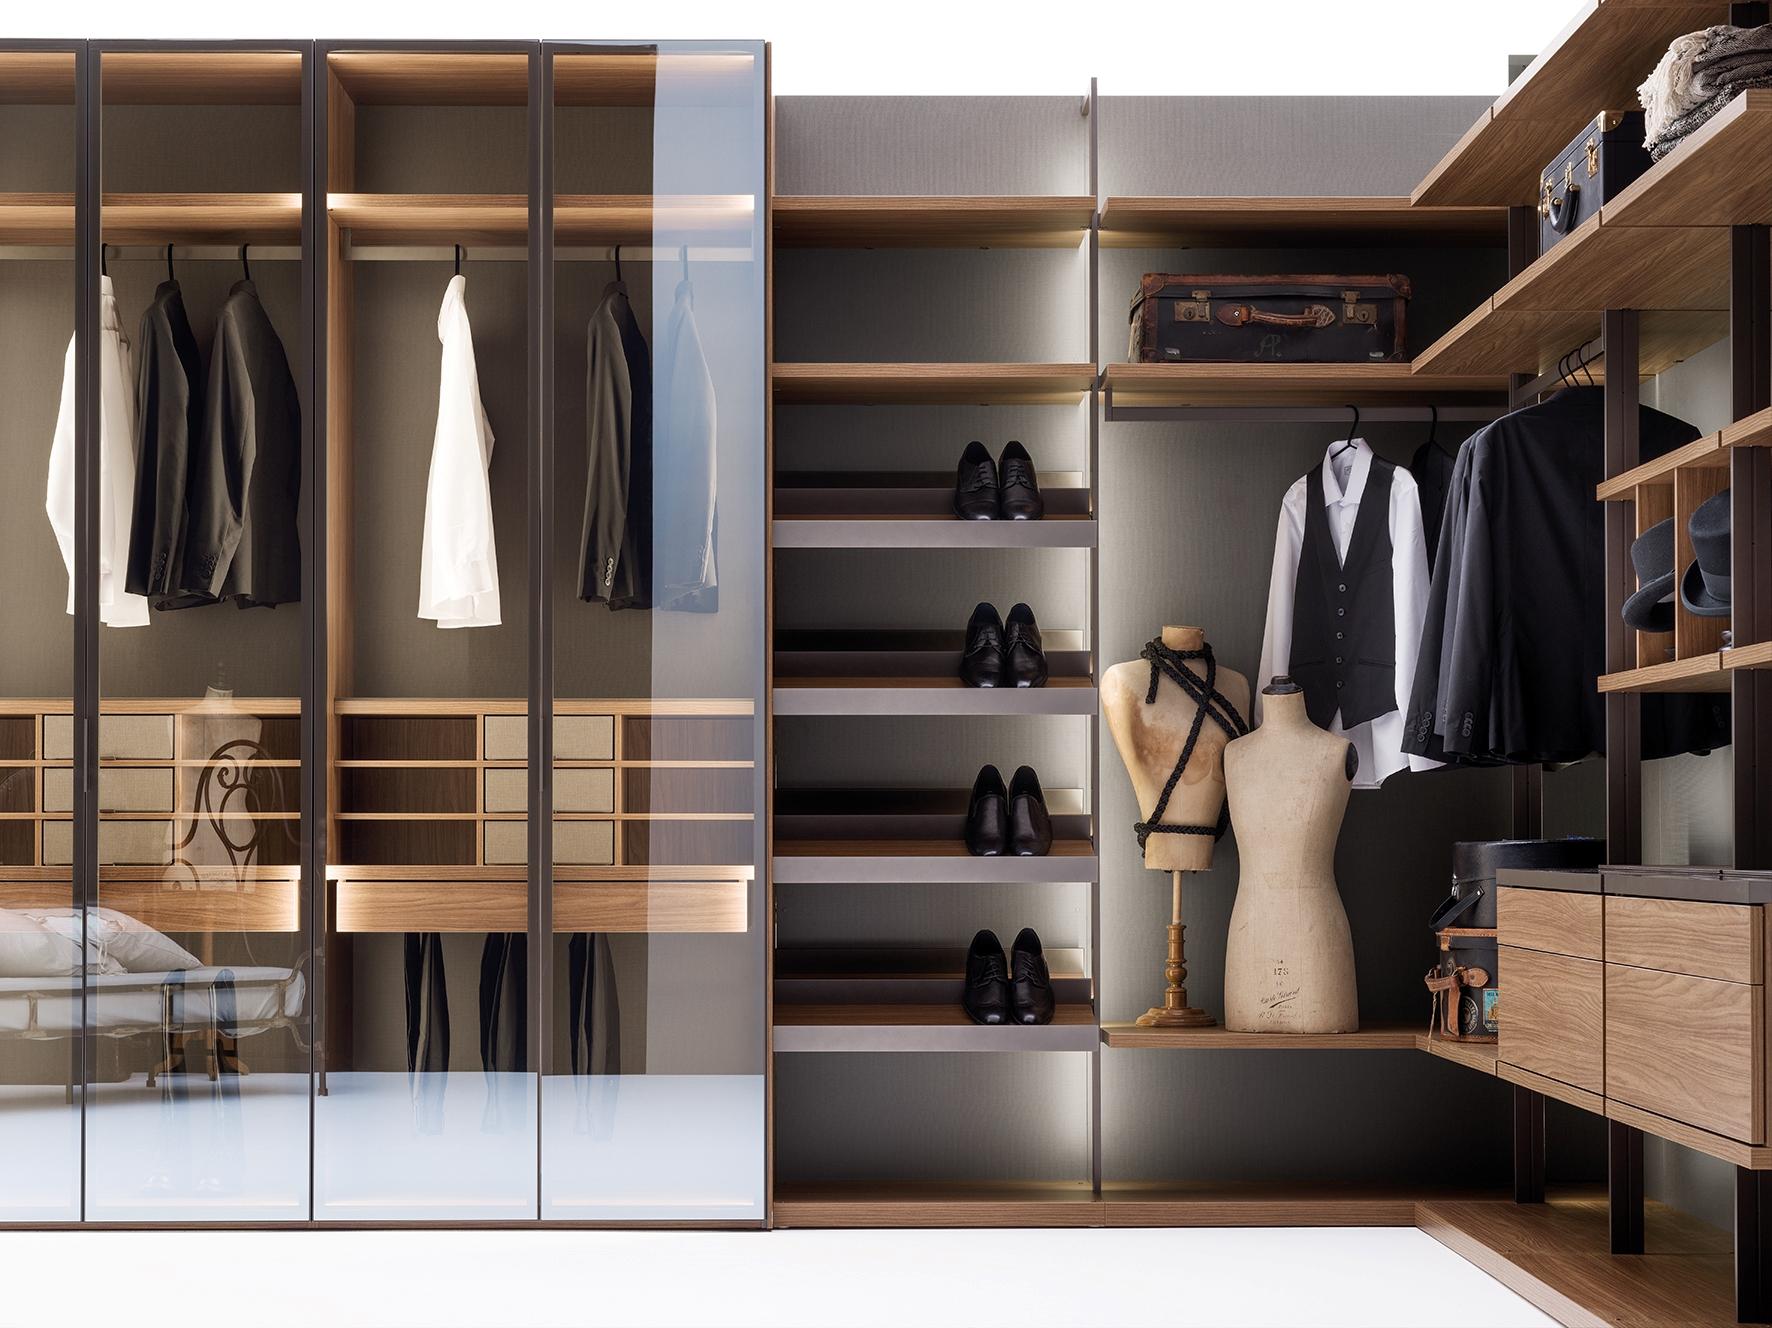 Walk-in Wardrobe by Caccaro.